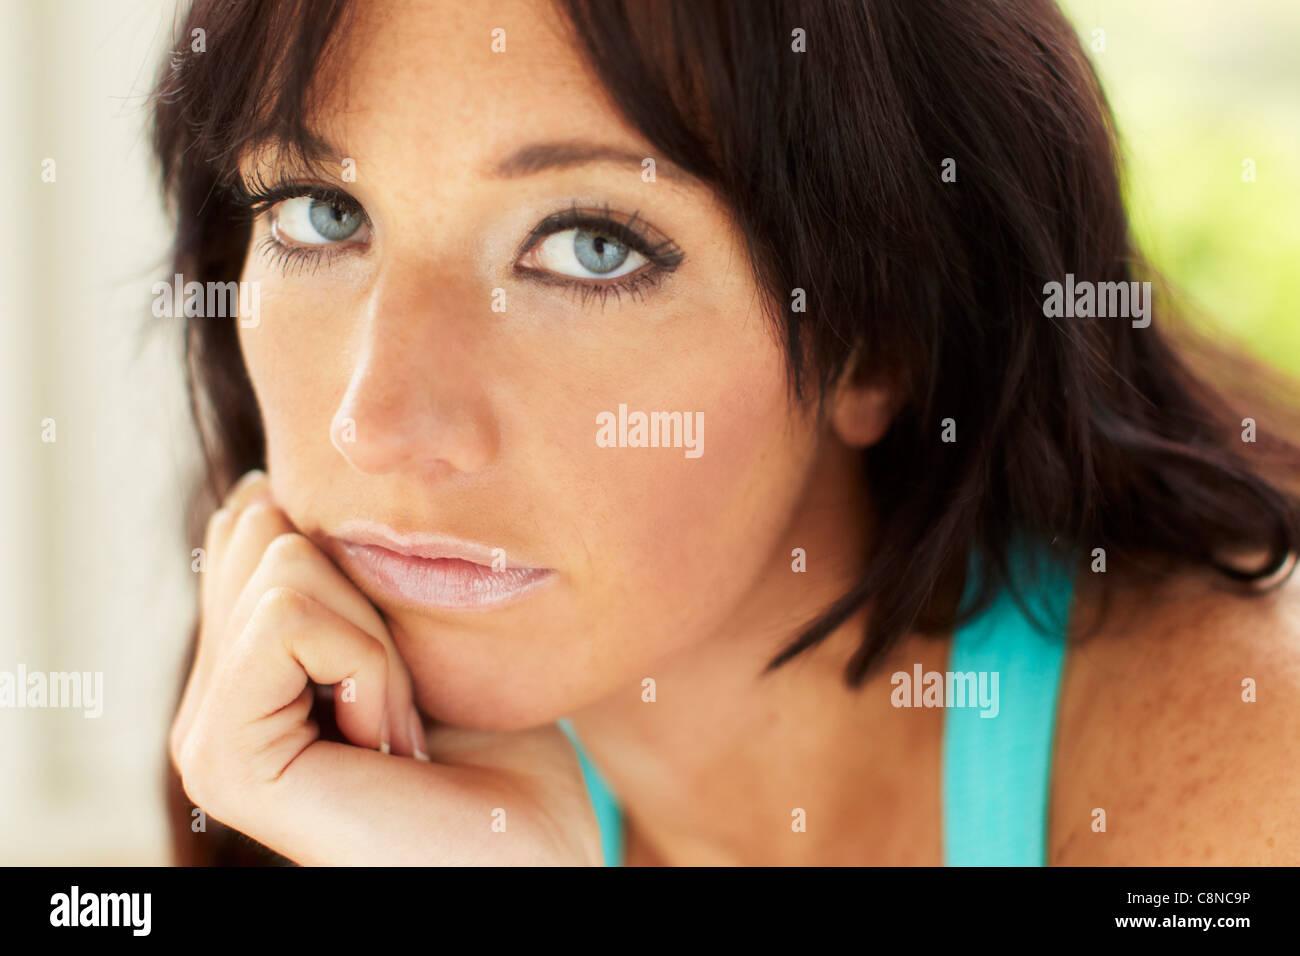 Traurig aussehende Frau Stockbild